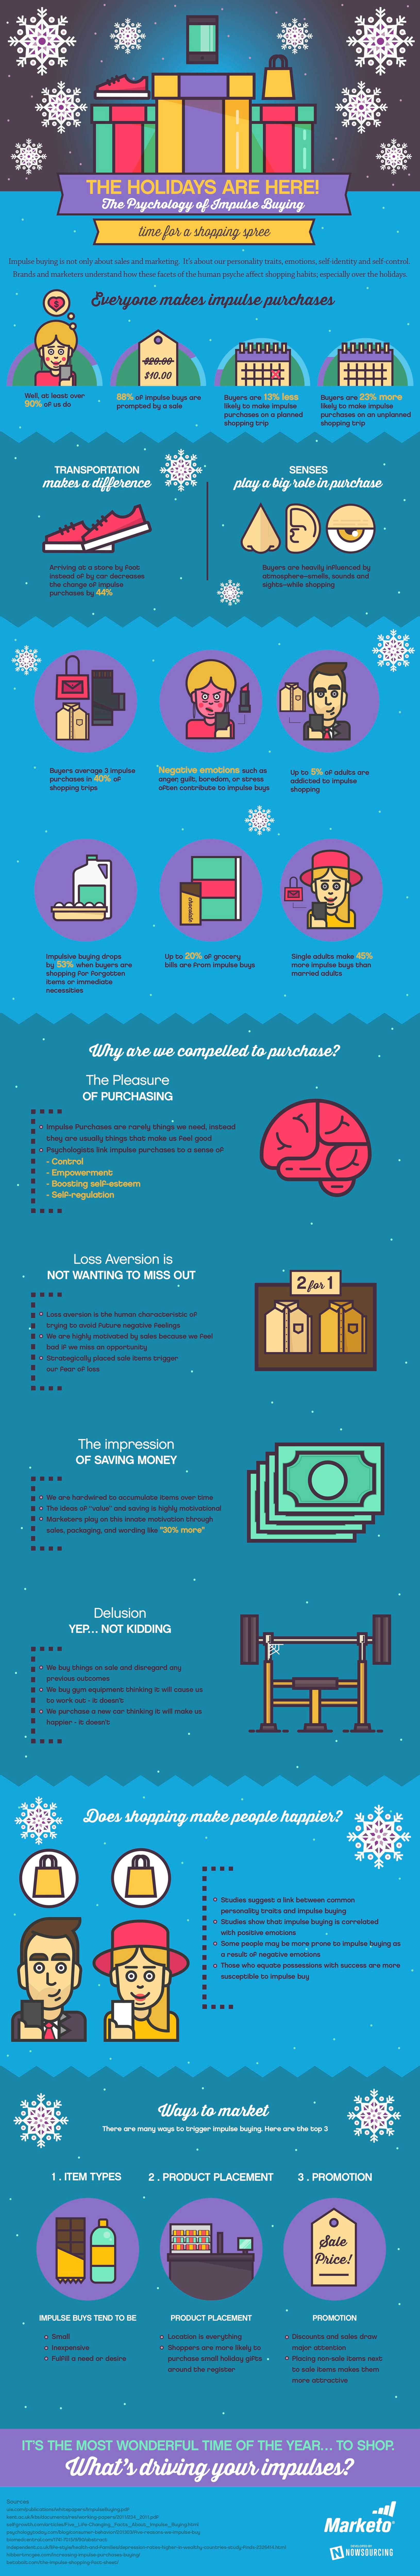 infographic showing psychology of impulse shopping